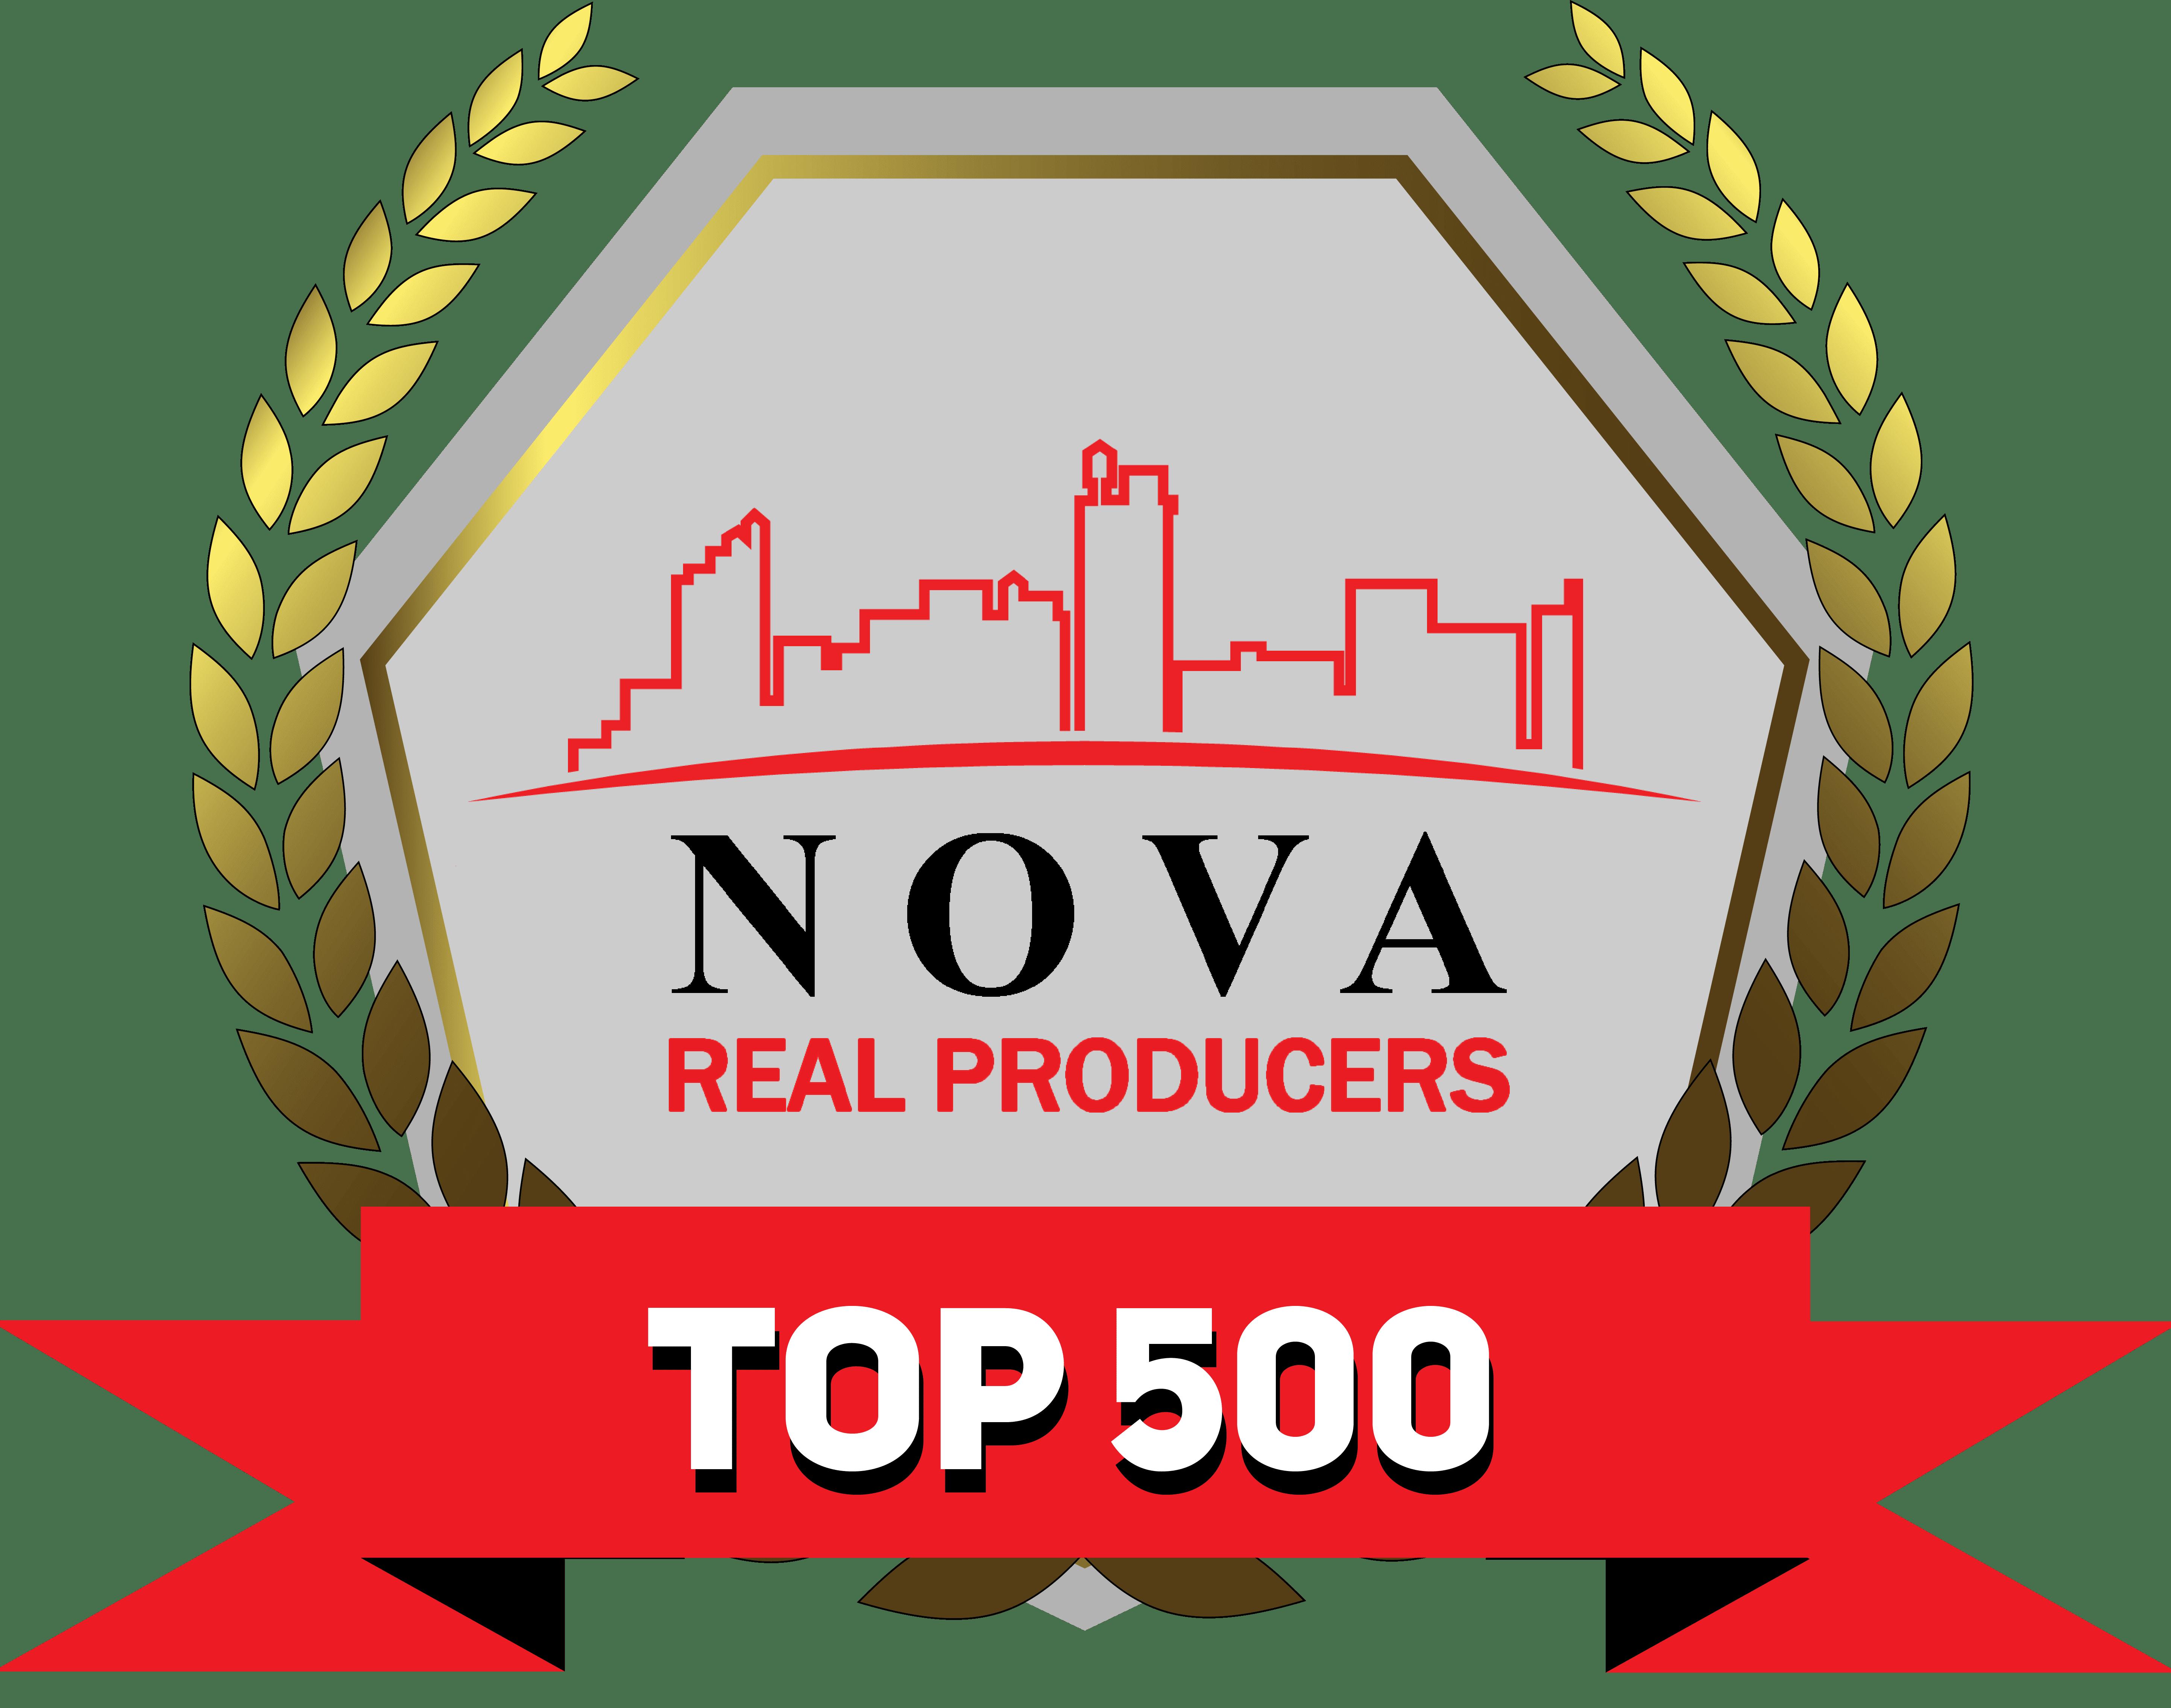 NOVA Top Producer 2020